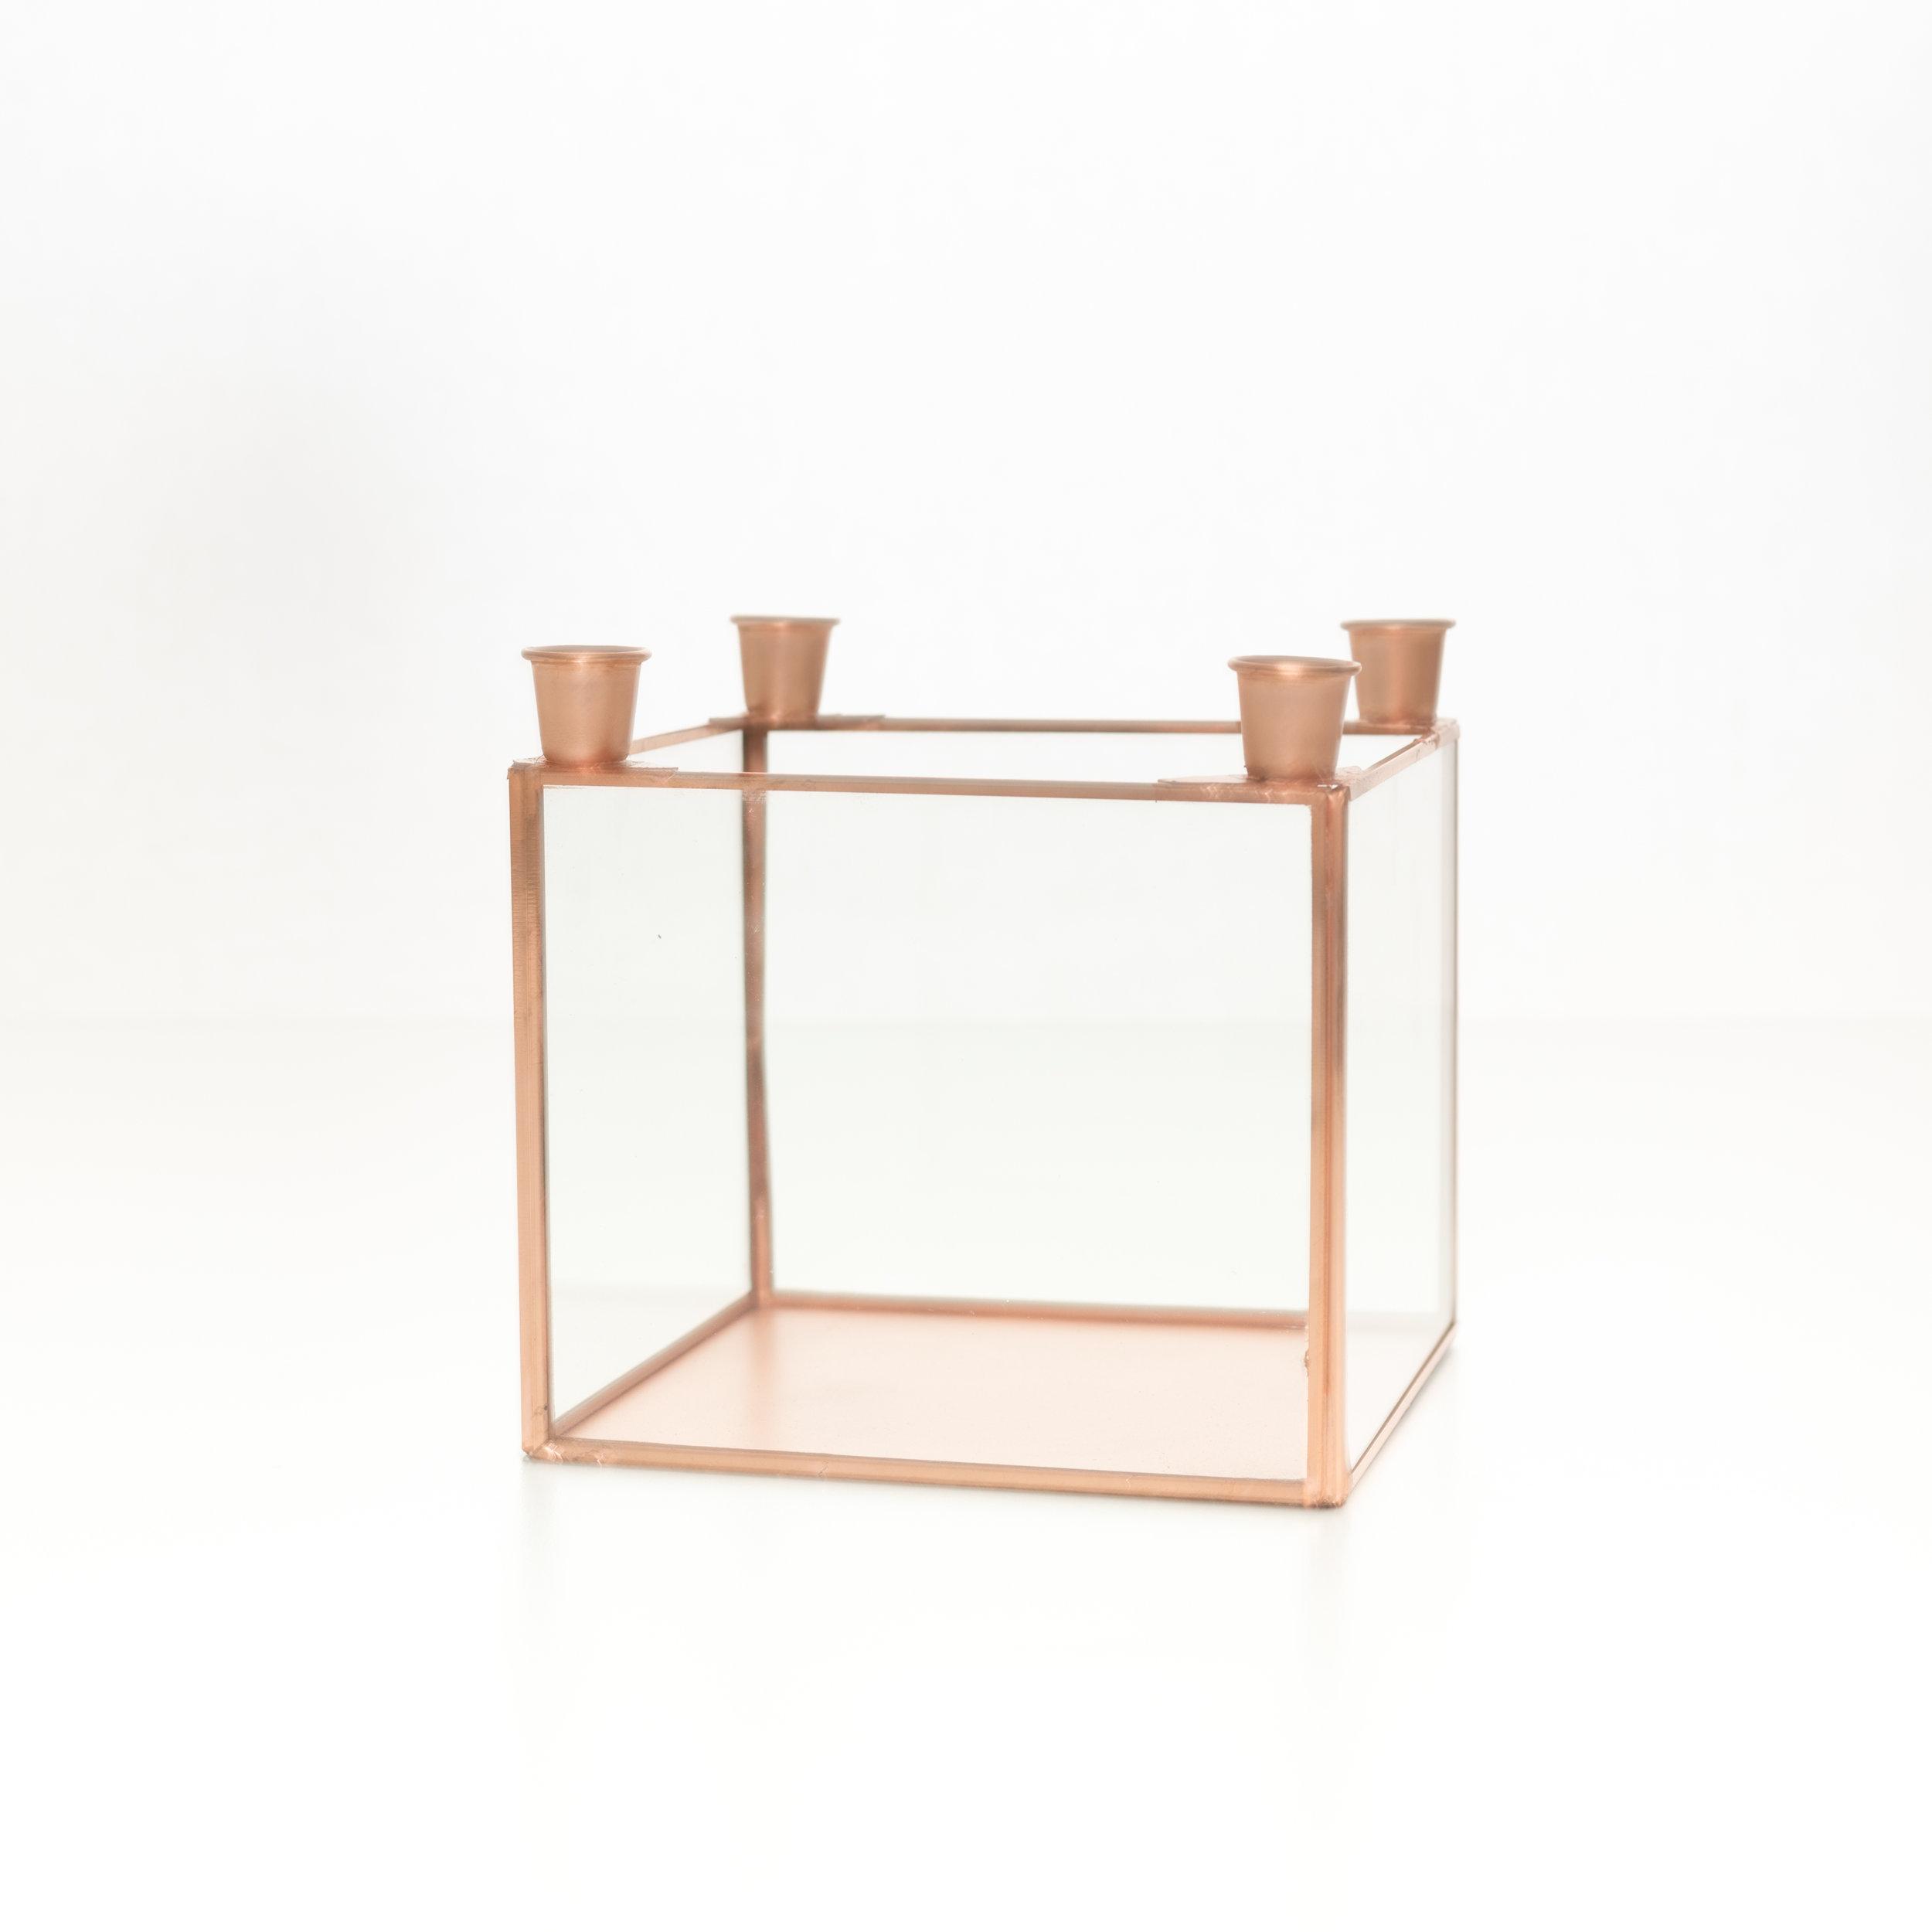 Copper candelabra